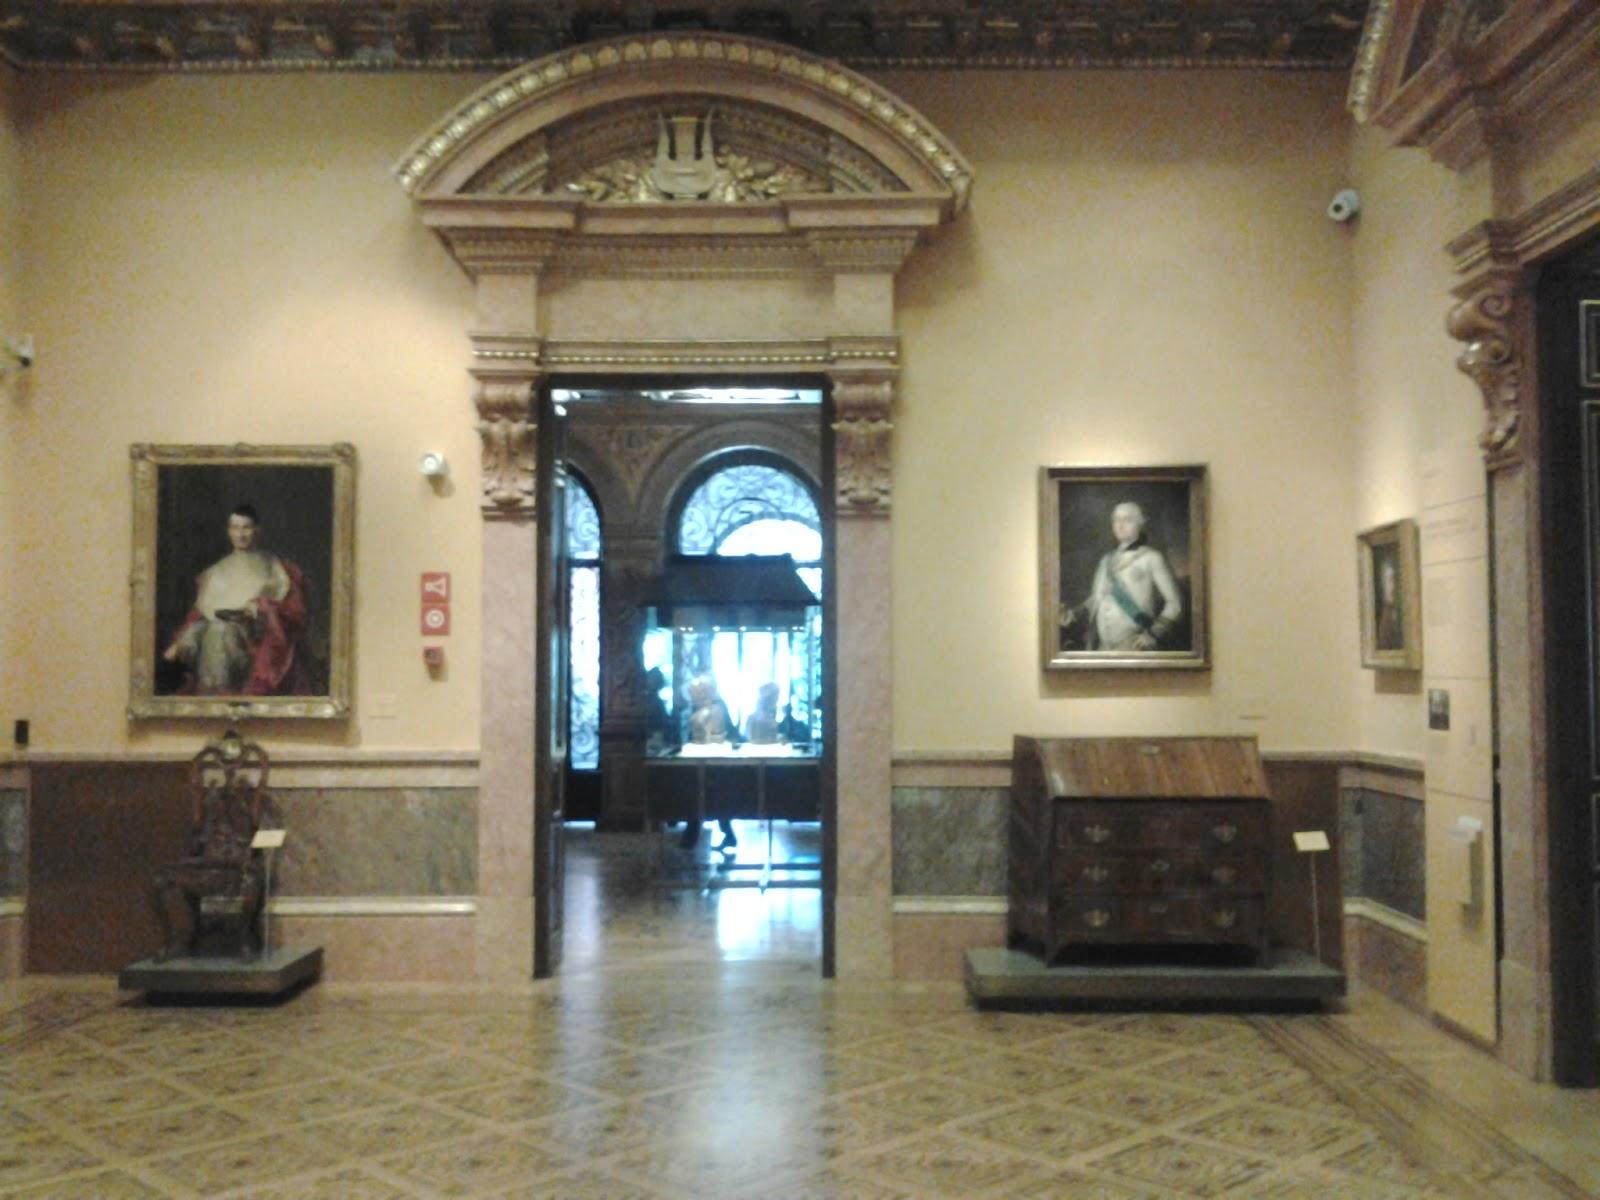 Madrid con encanto museo l zaro galdiano for Battlefield 1 salon de baile